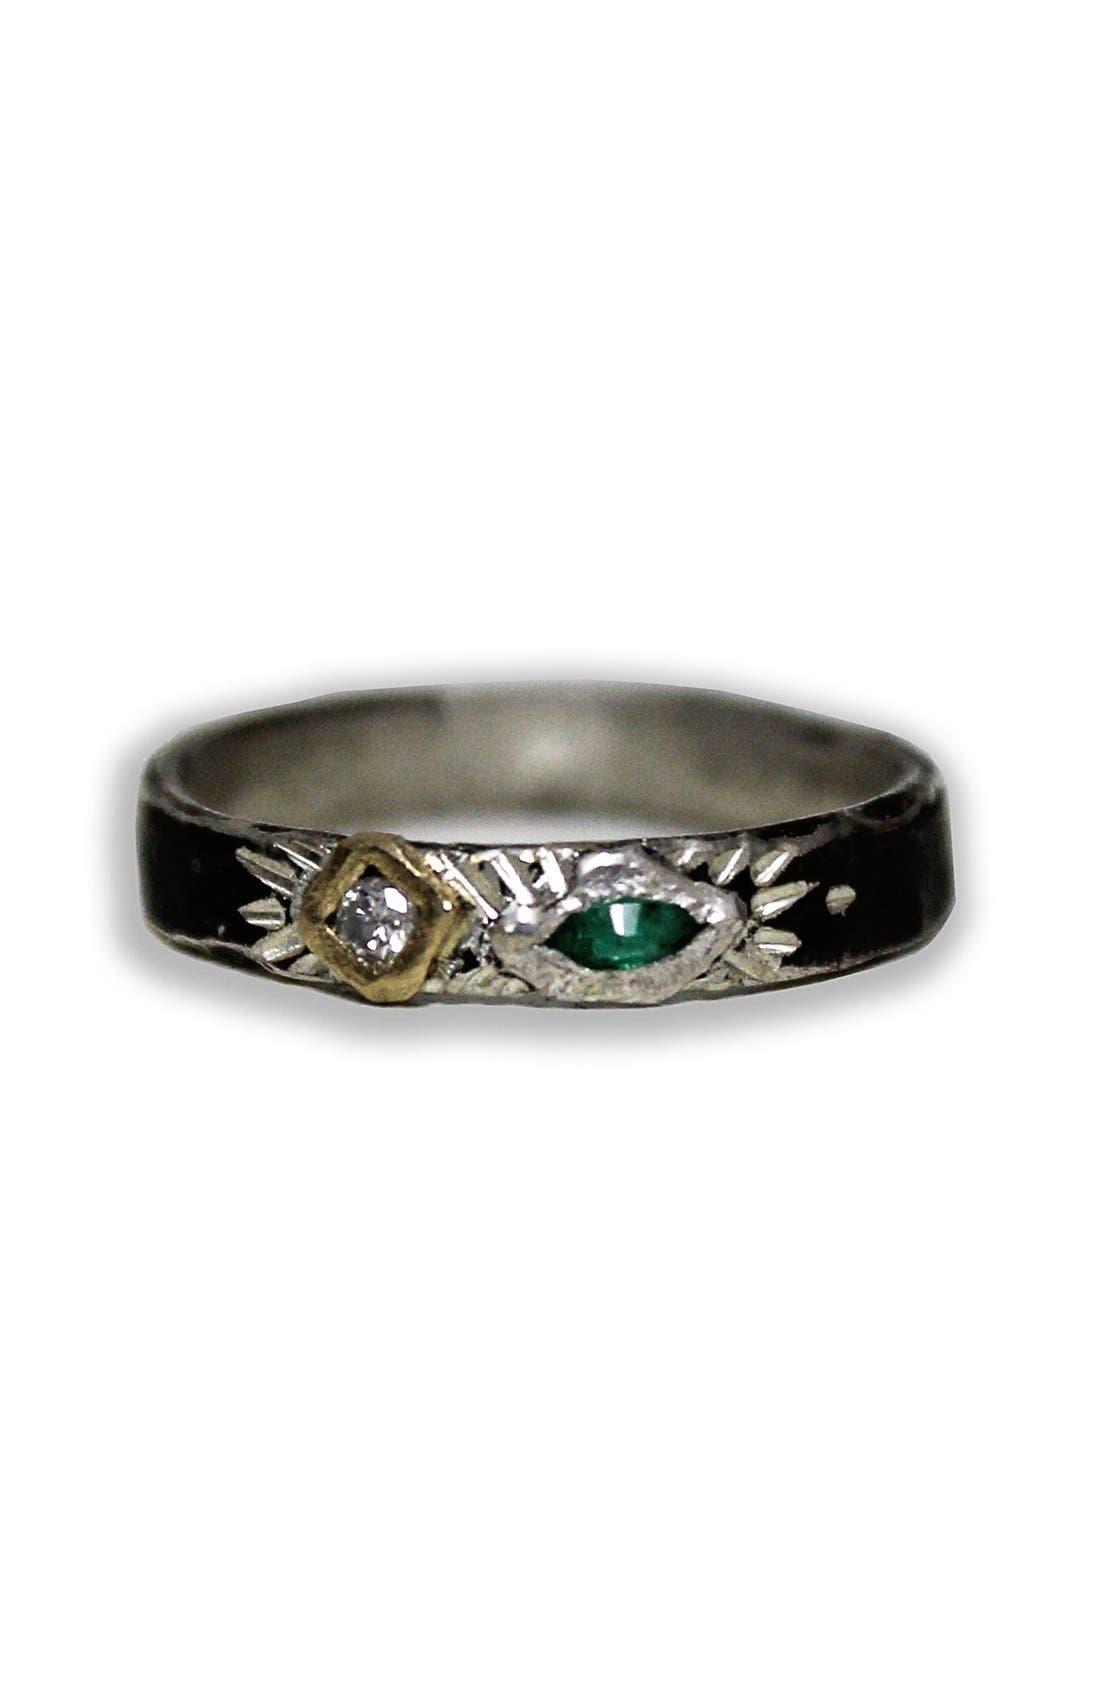 Alternate Image 1 Selected - Franny E Jewelry Diamond & Emerald Stacker Ring